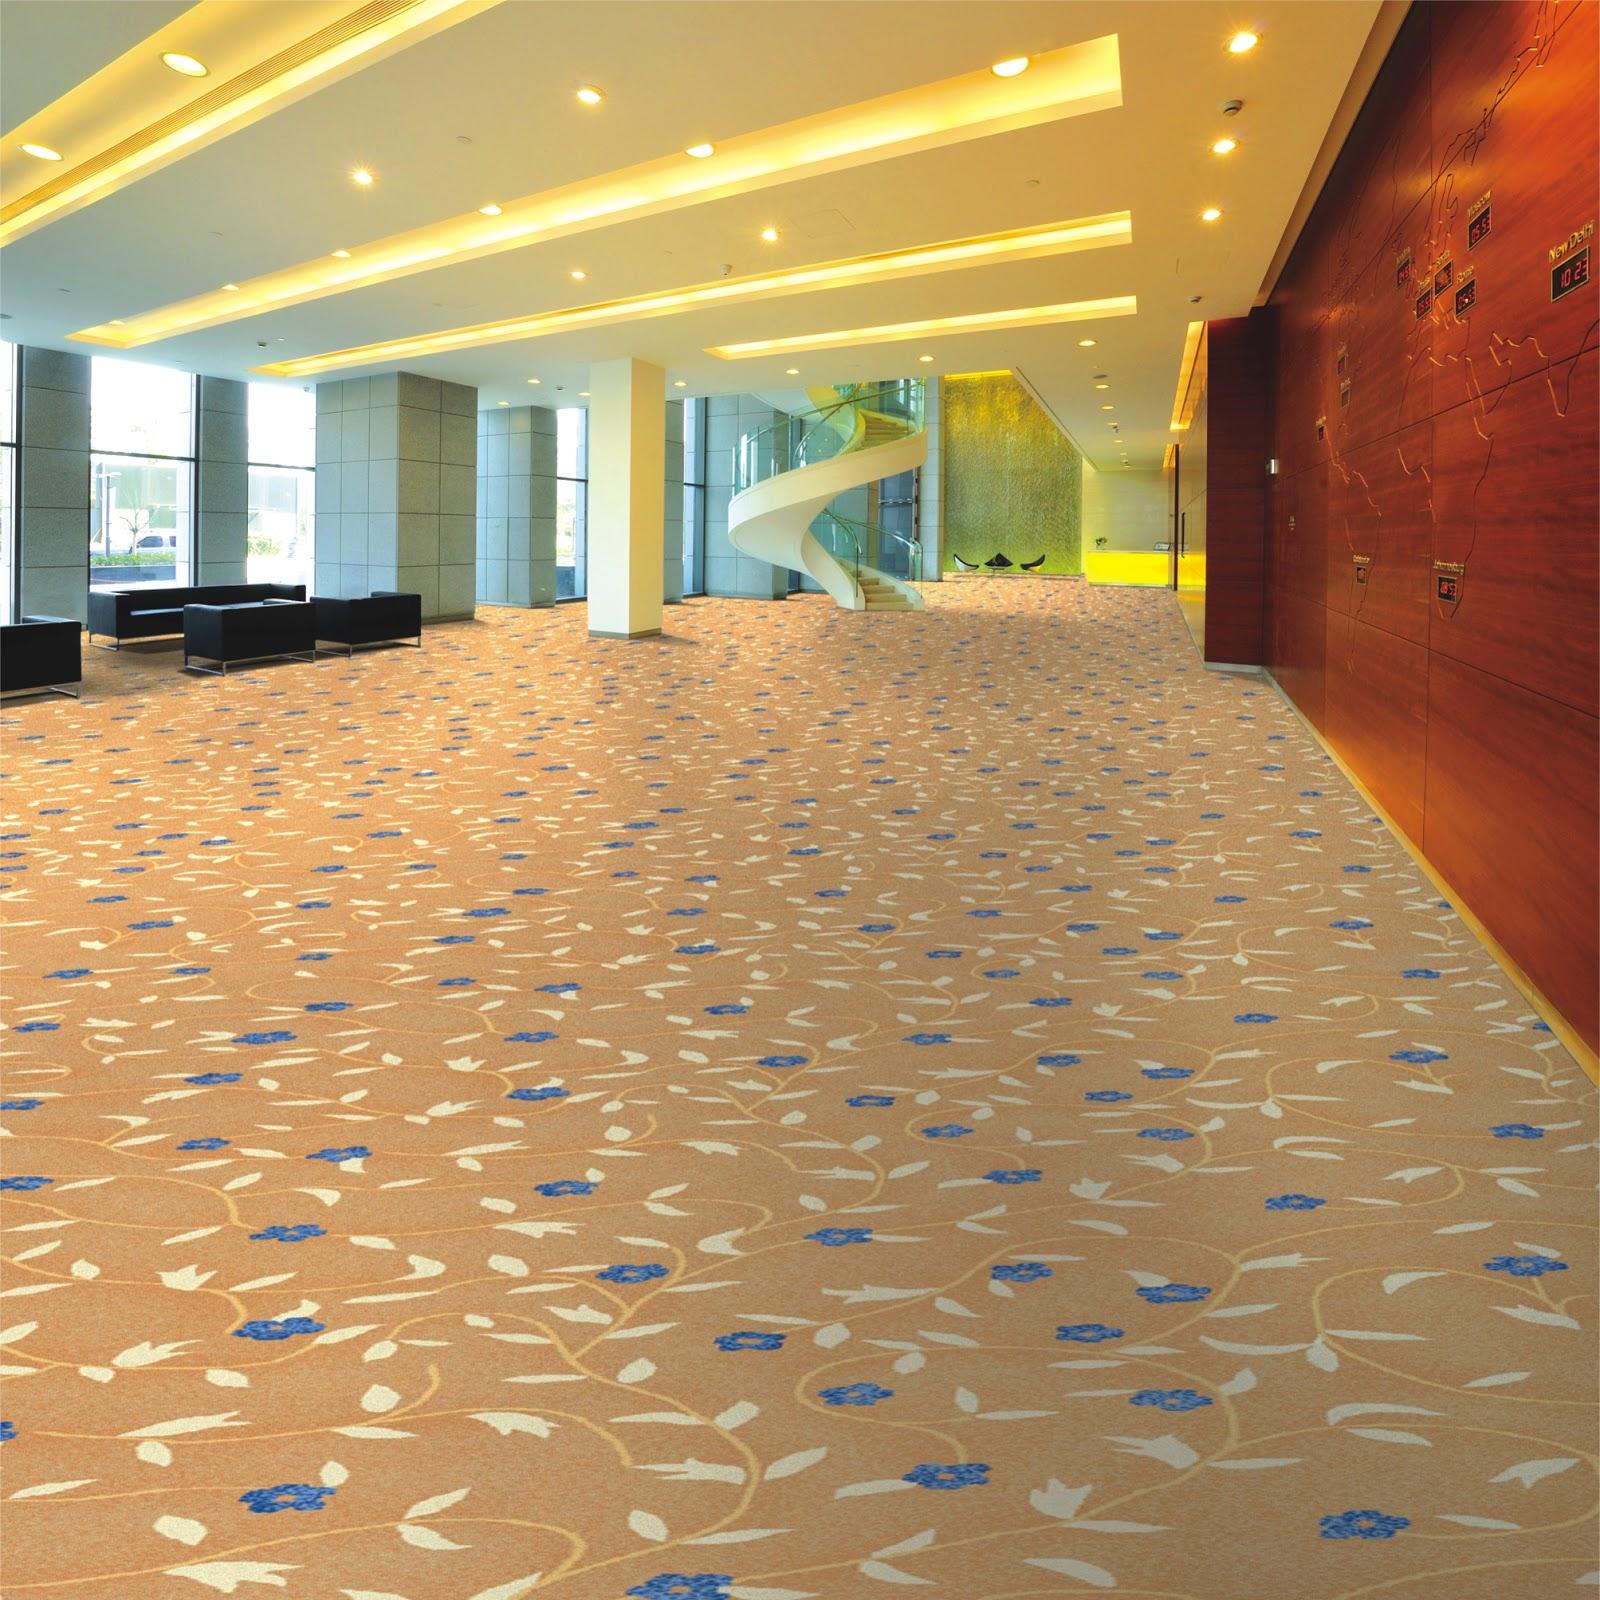 Axminster Carpets Carpet Tile Machine Tufted Broadloom